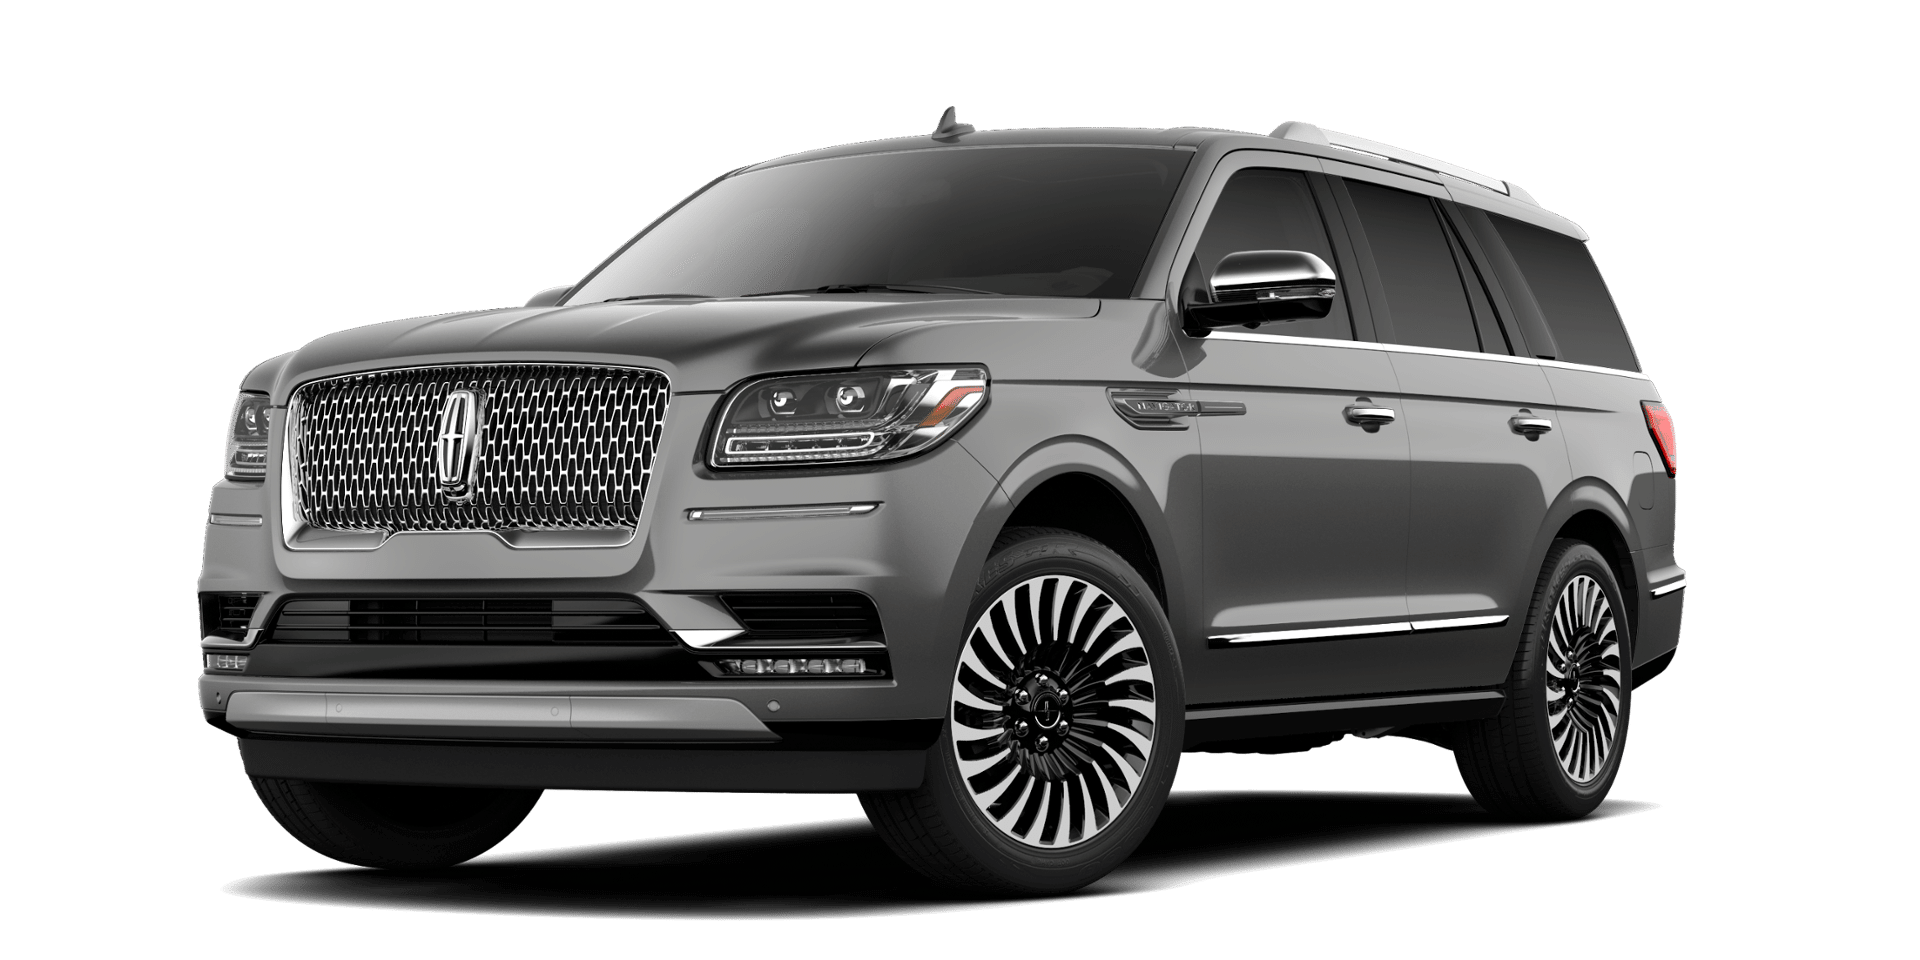 Lincoln Black Label >> 新車カタログ - 2018 リンカーン ナビゲーター | キャルウイング | 輸入車販売店